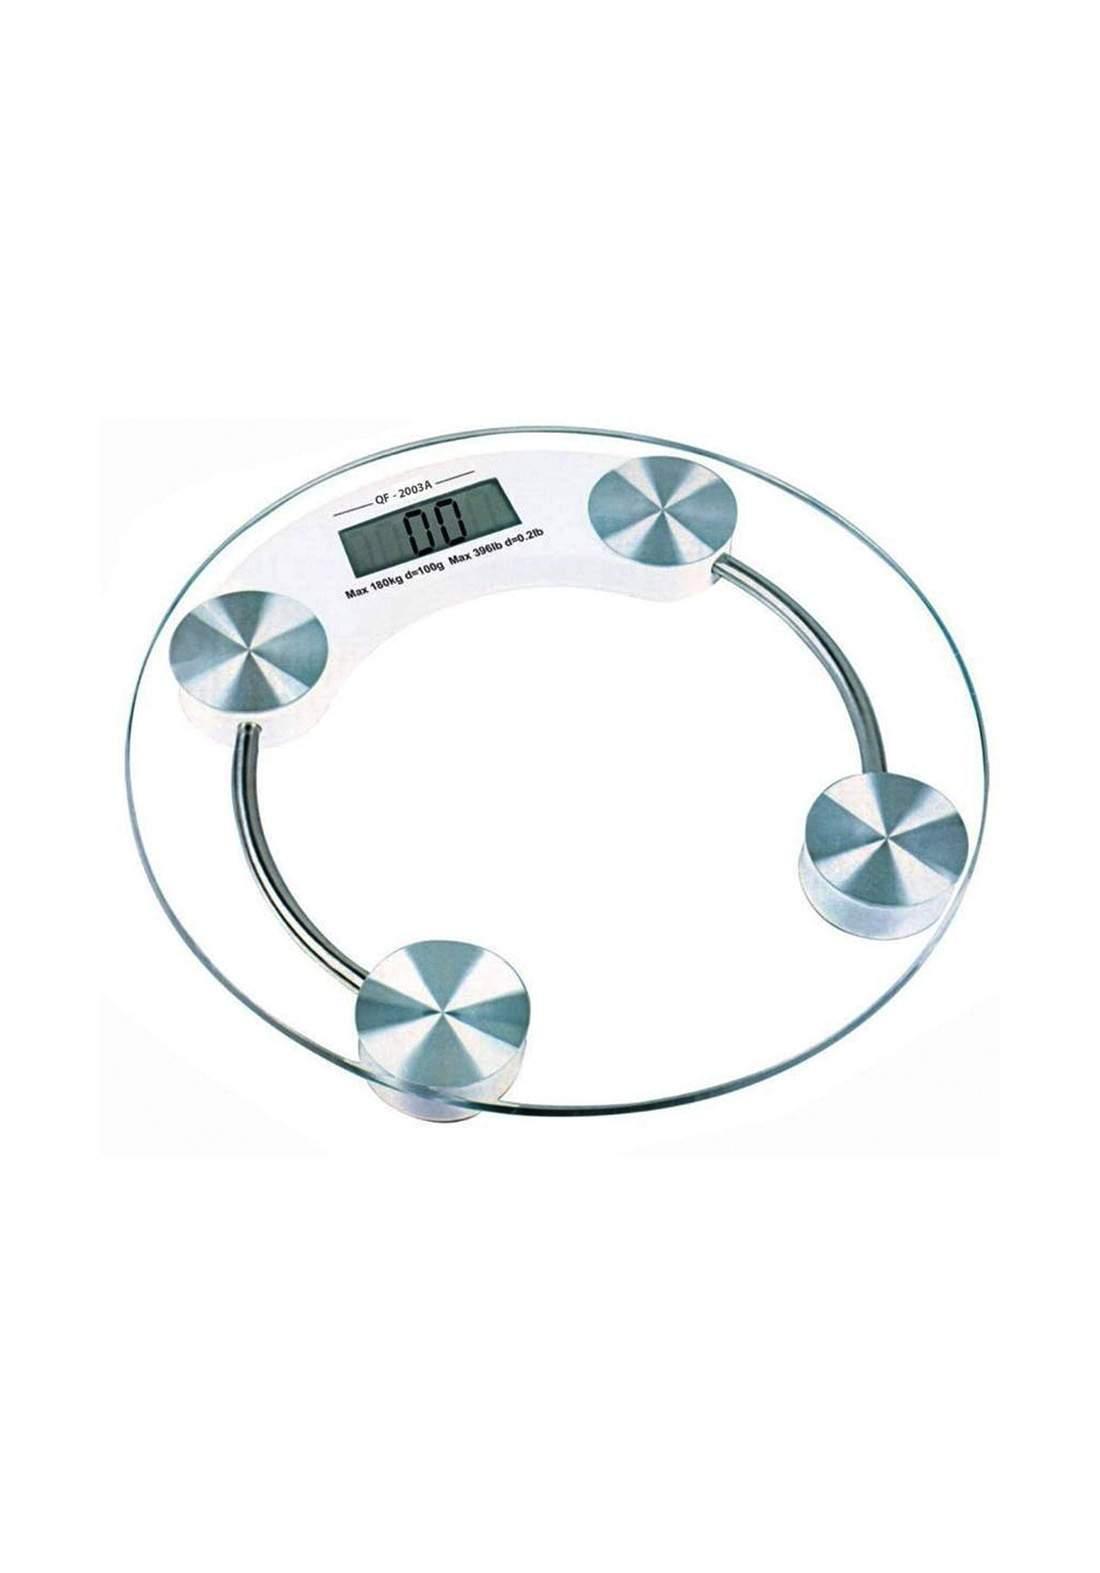 Lanwei LW-0493 Transparent Electronic Scale ميزان رقمي لقياس الوزن